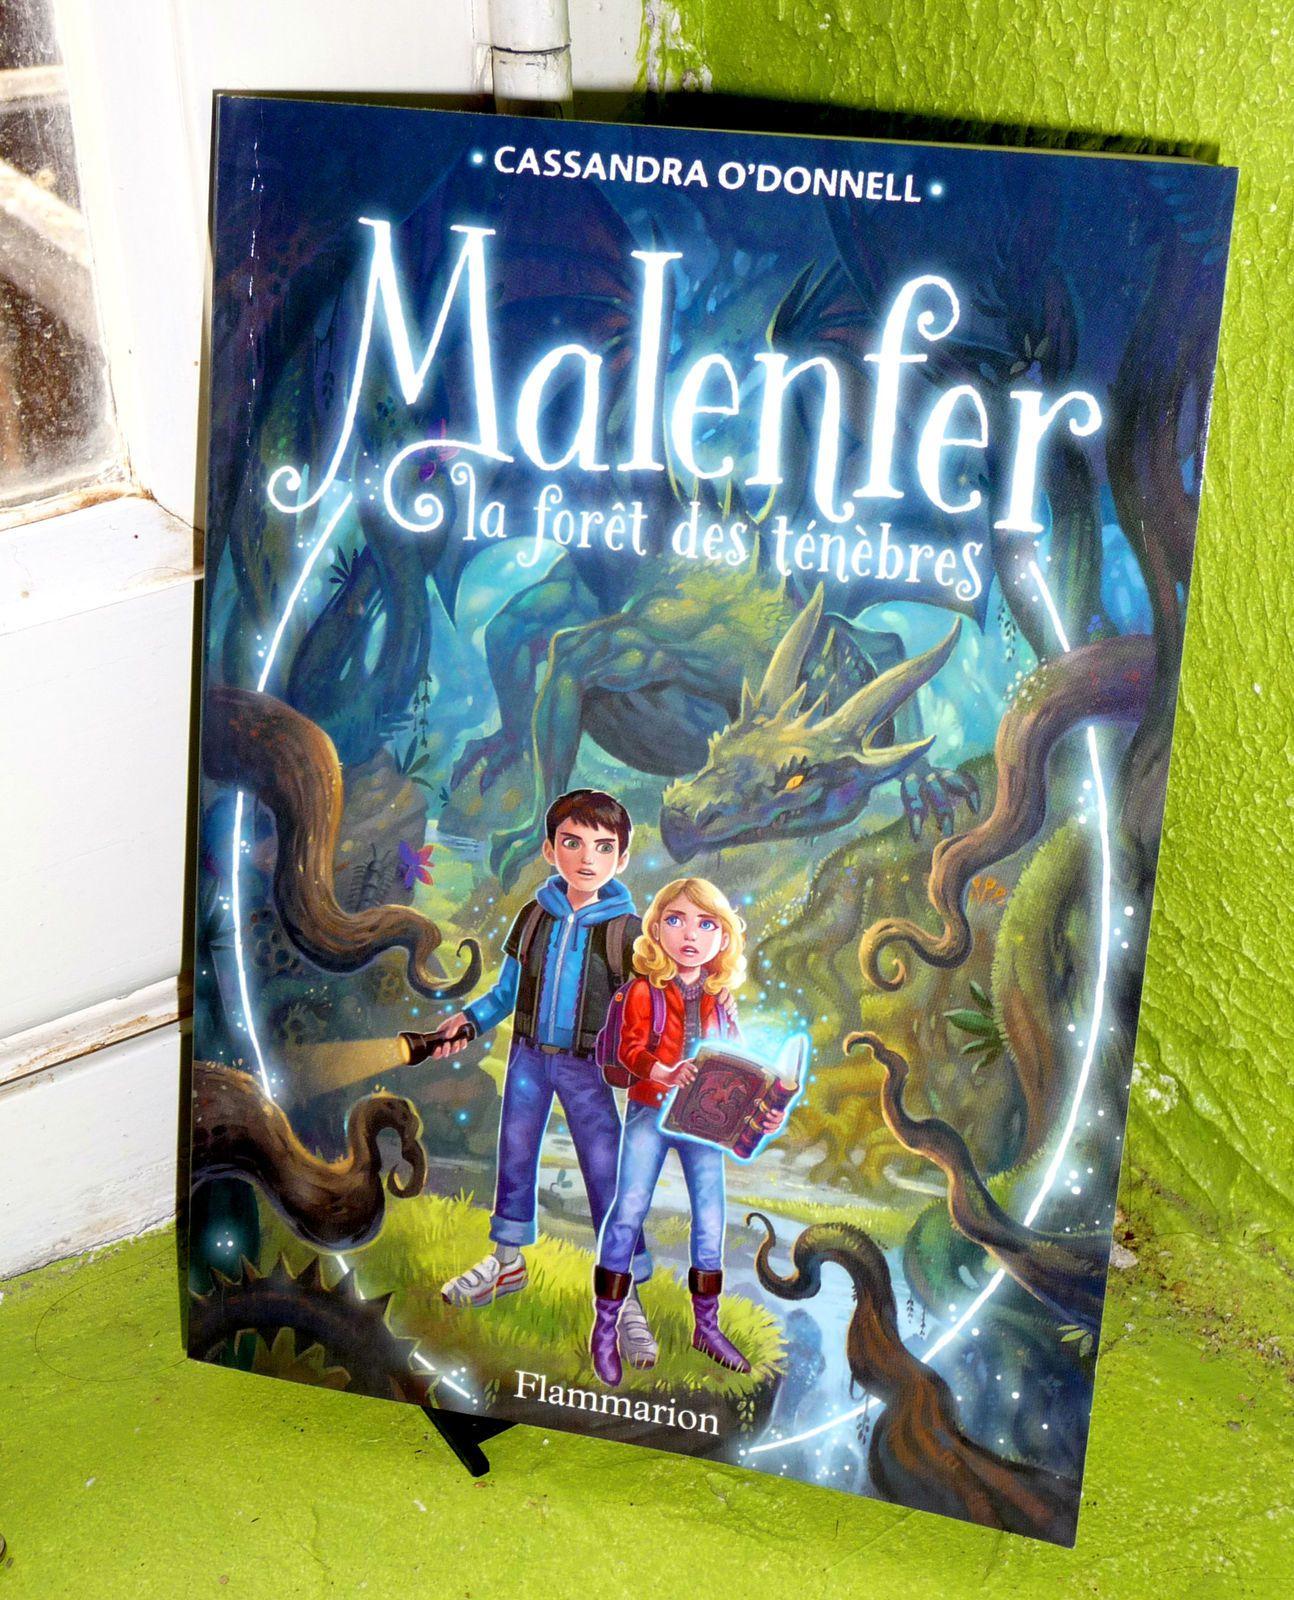 Malenfer - Cassandra O'Donnell